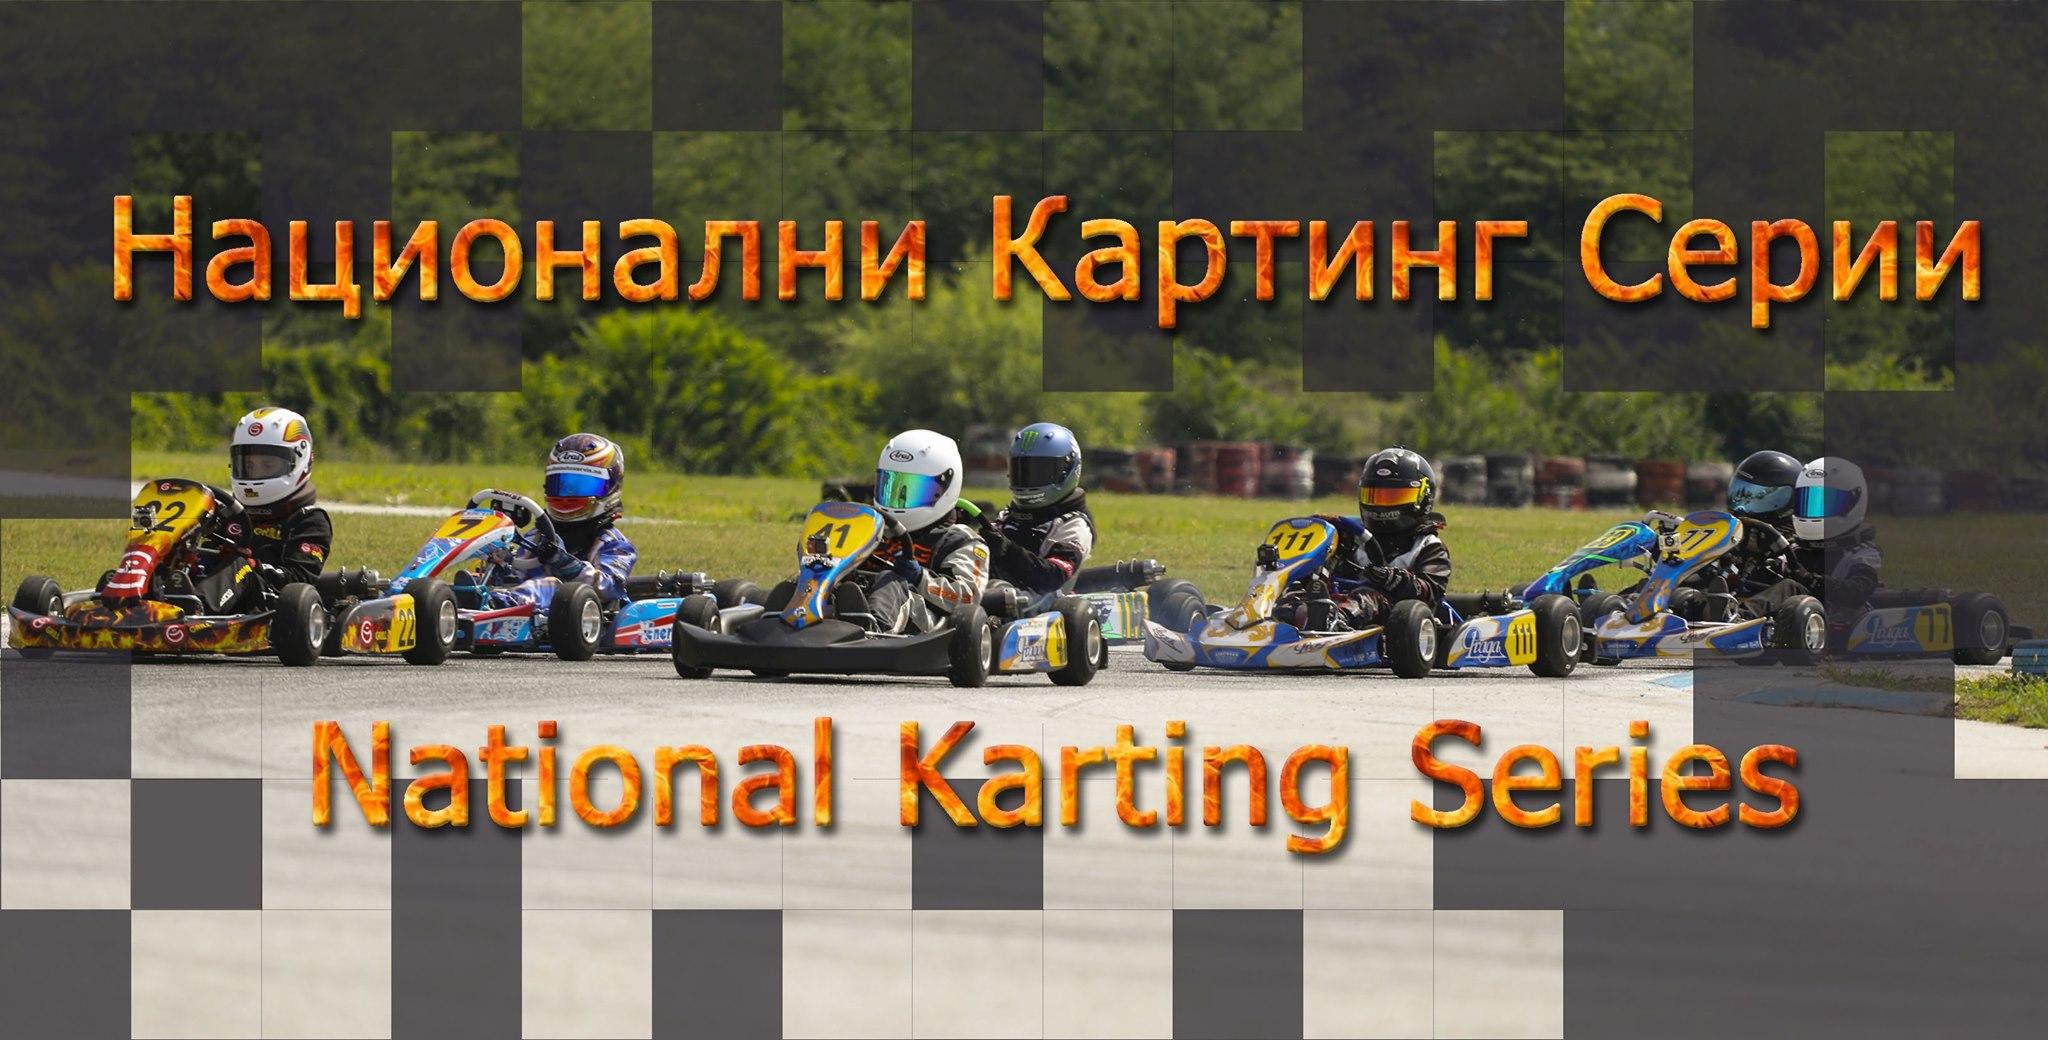 Национални картинг серии